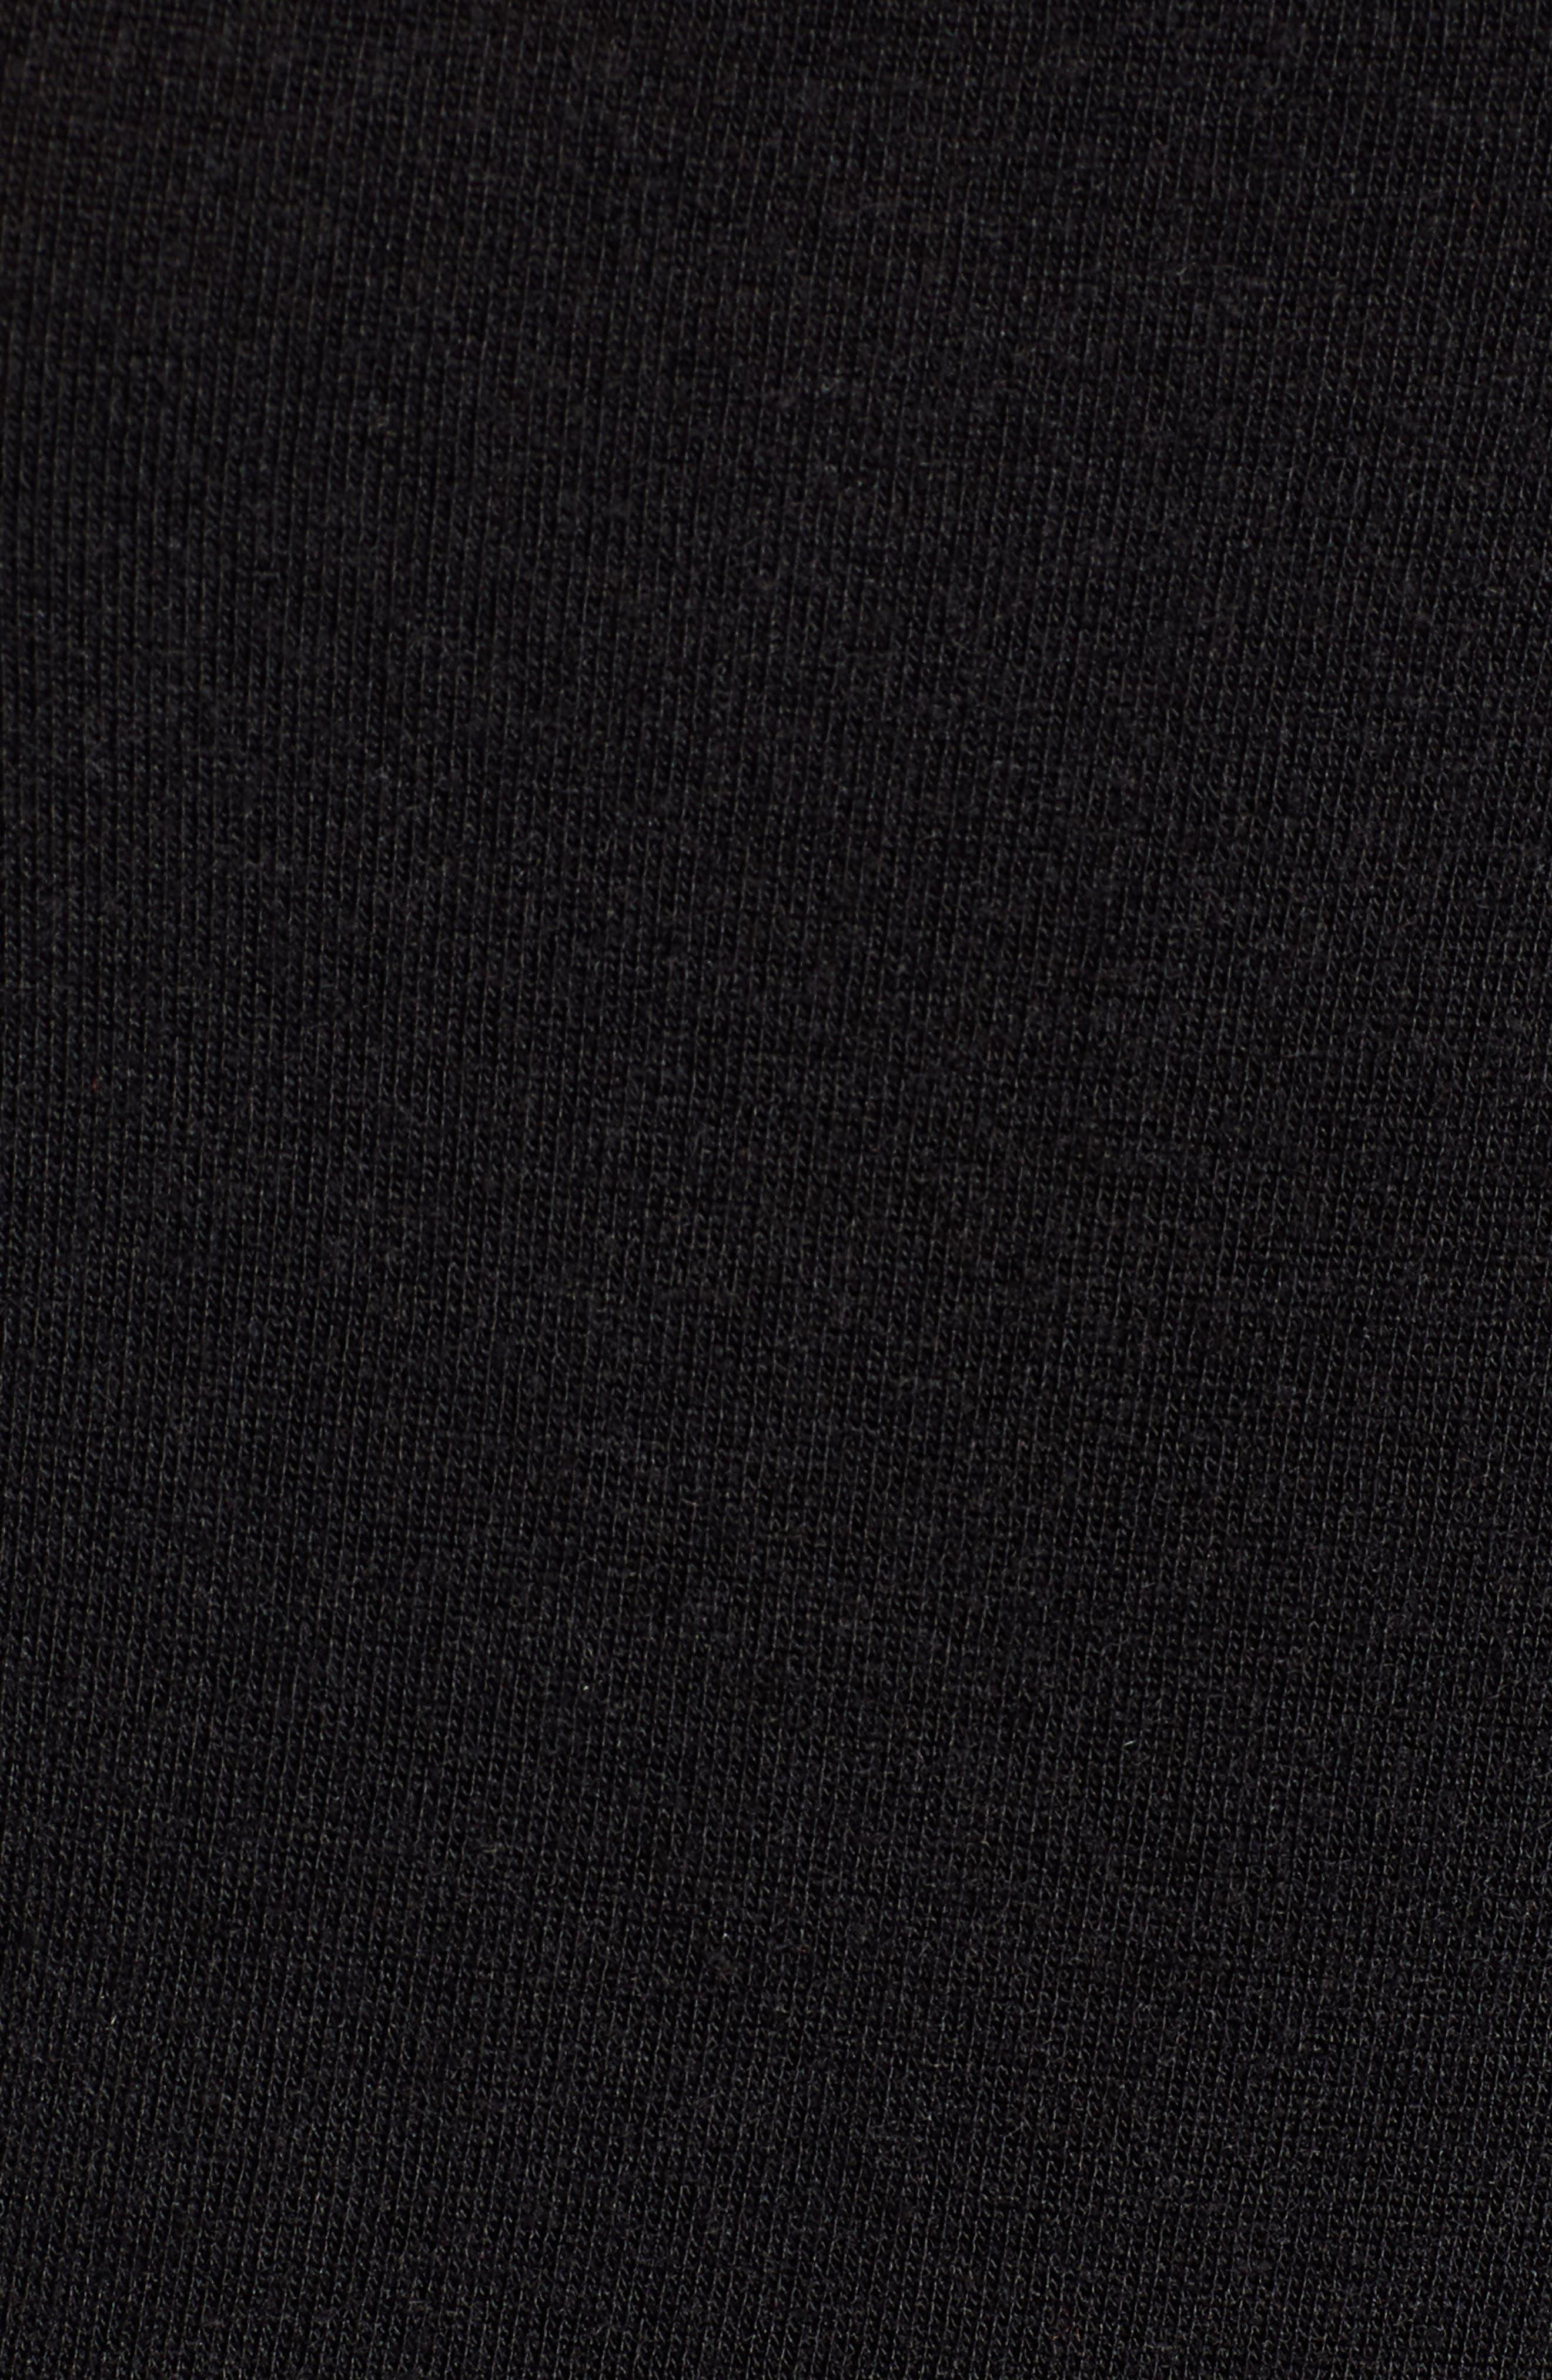 Square Neck Slim Knit Top,                             Alternate thumbnail 5, color,                             001